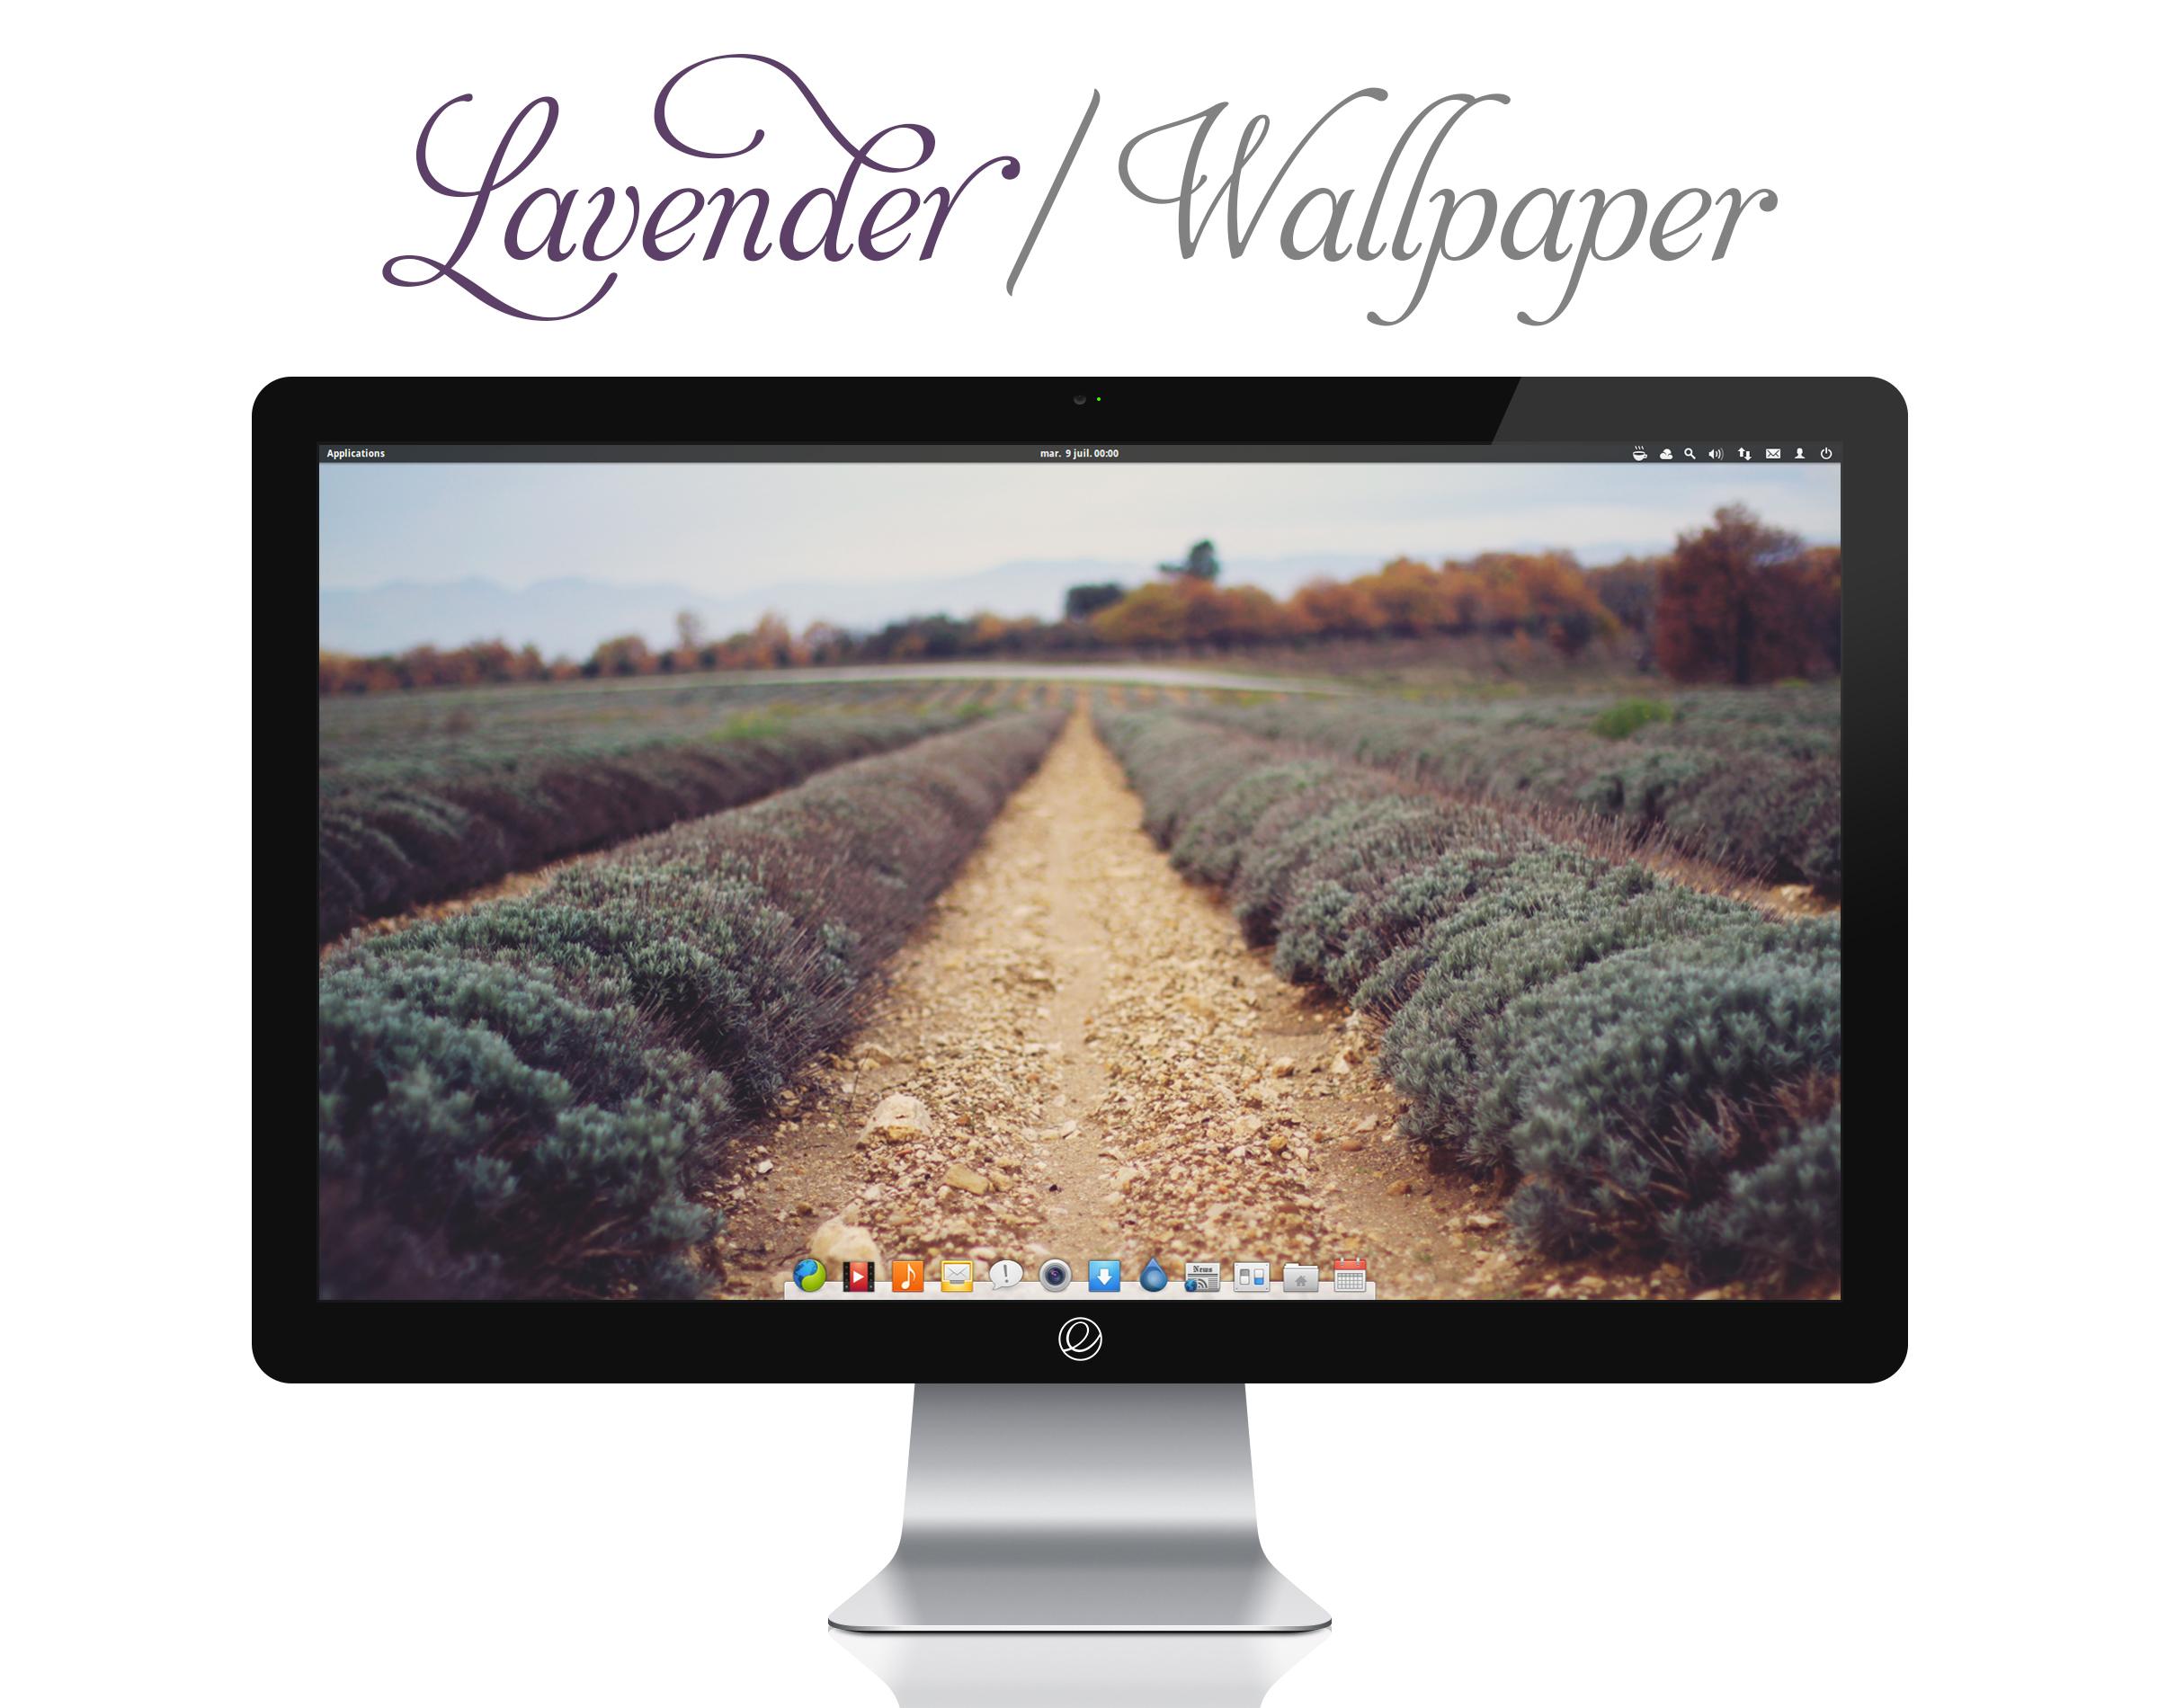 Lavender Wallpaper by bokehlicia